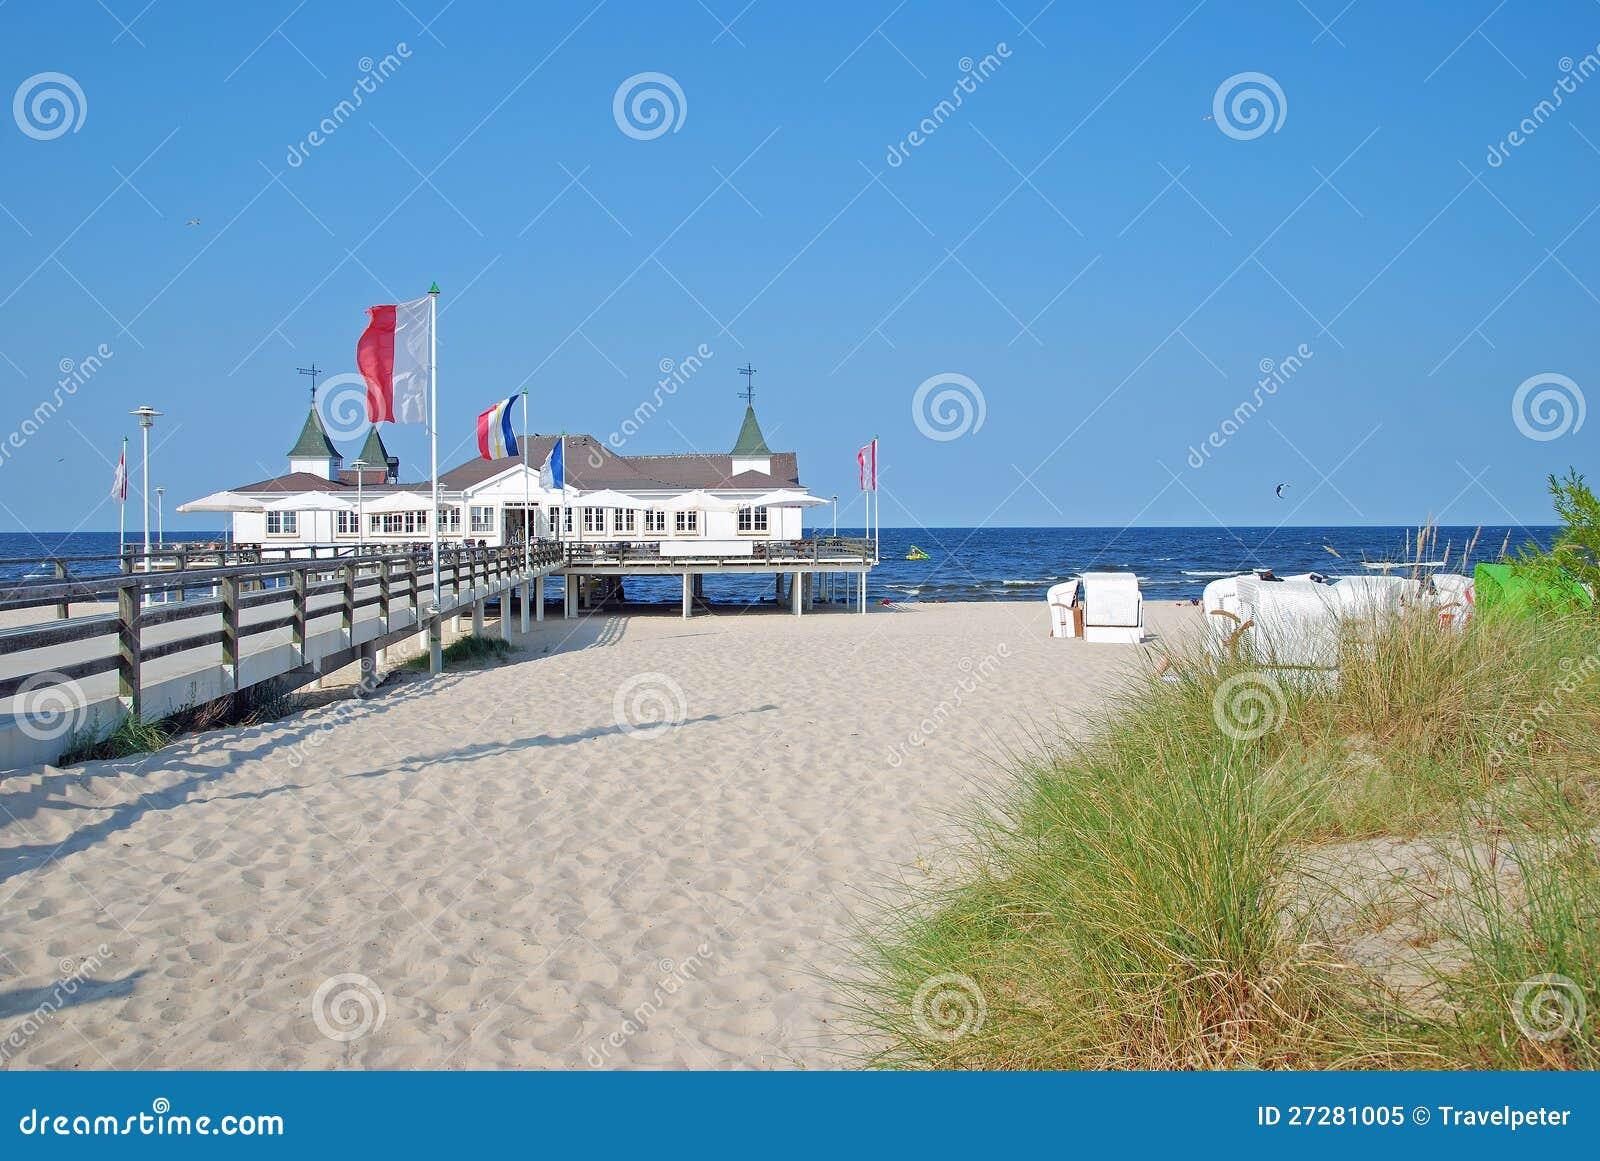 Ahlbeck,usedom island,Baltic Sea,Germany